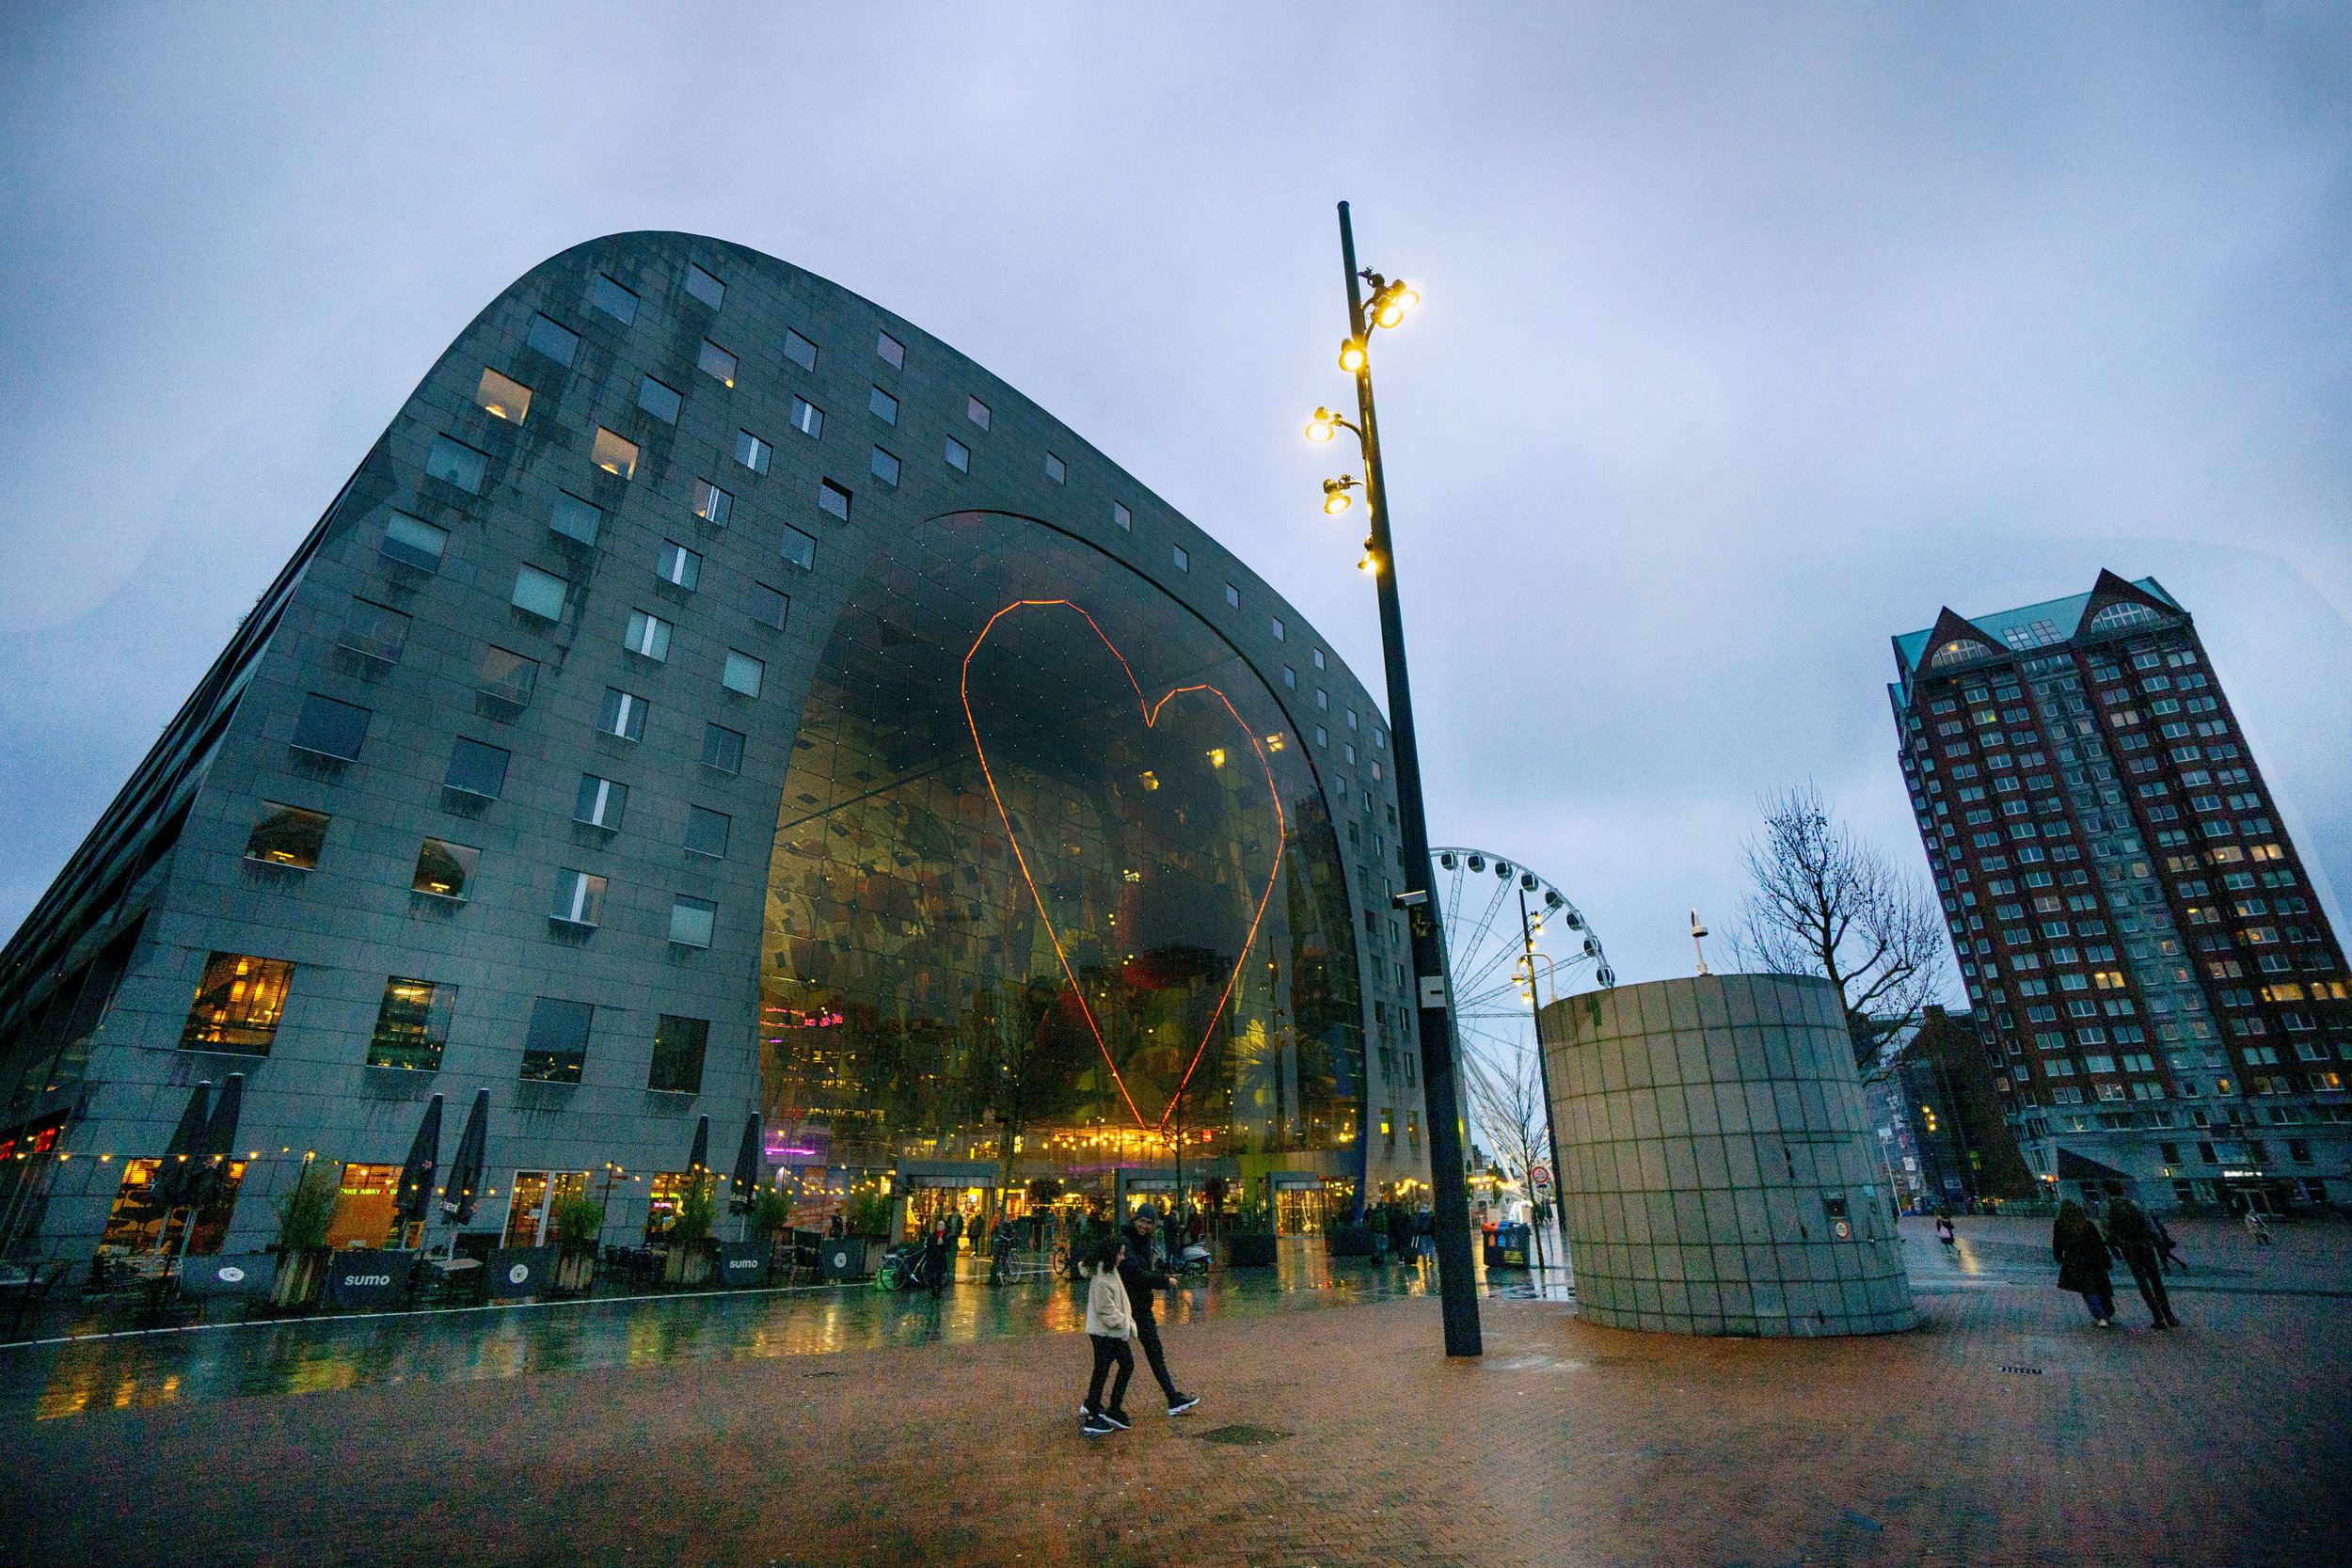 Rotterdam_markthal_vickygood_treveling_photogrpahy2_sm.jpg